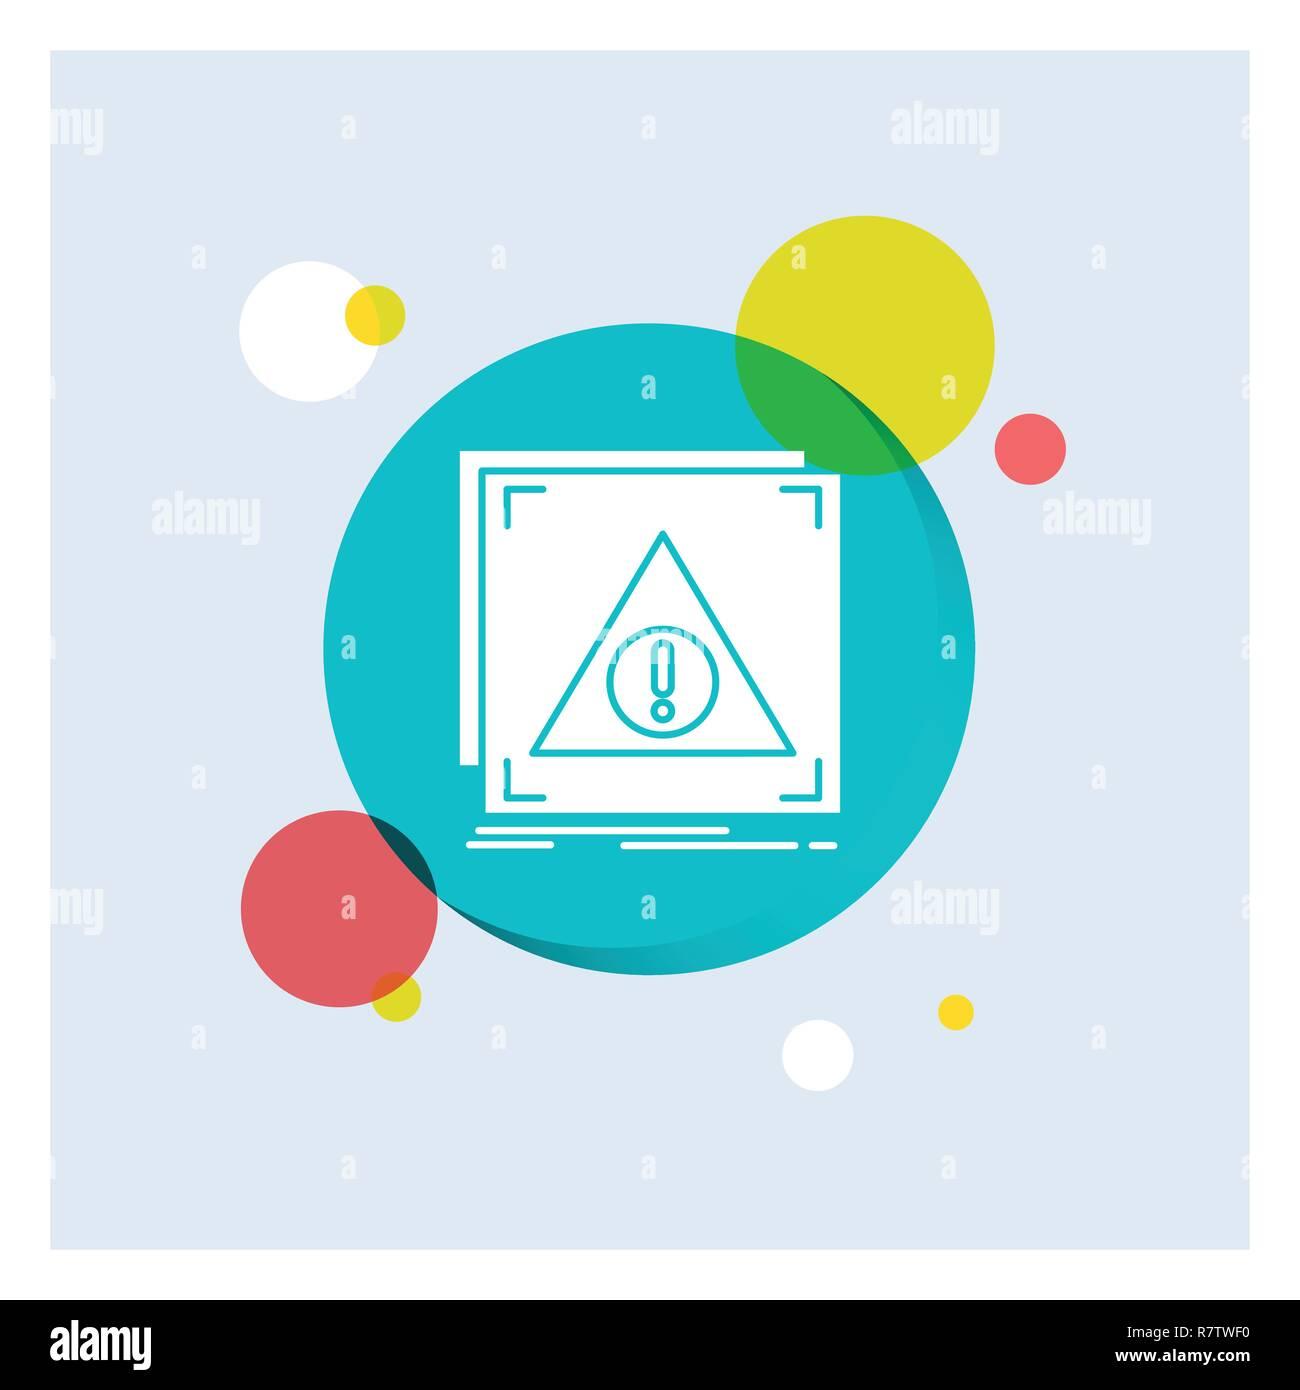 Error, Application, Denied, server, alert White Glyph Icon colorful Circle Background - Stock Image